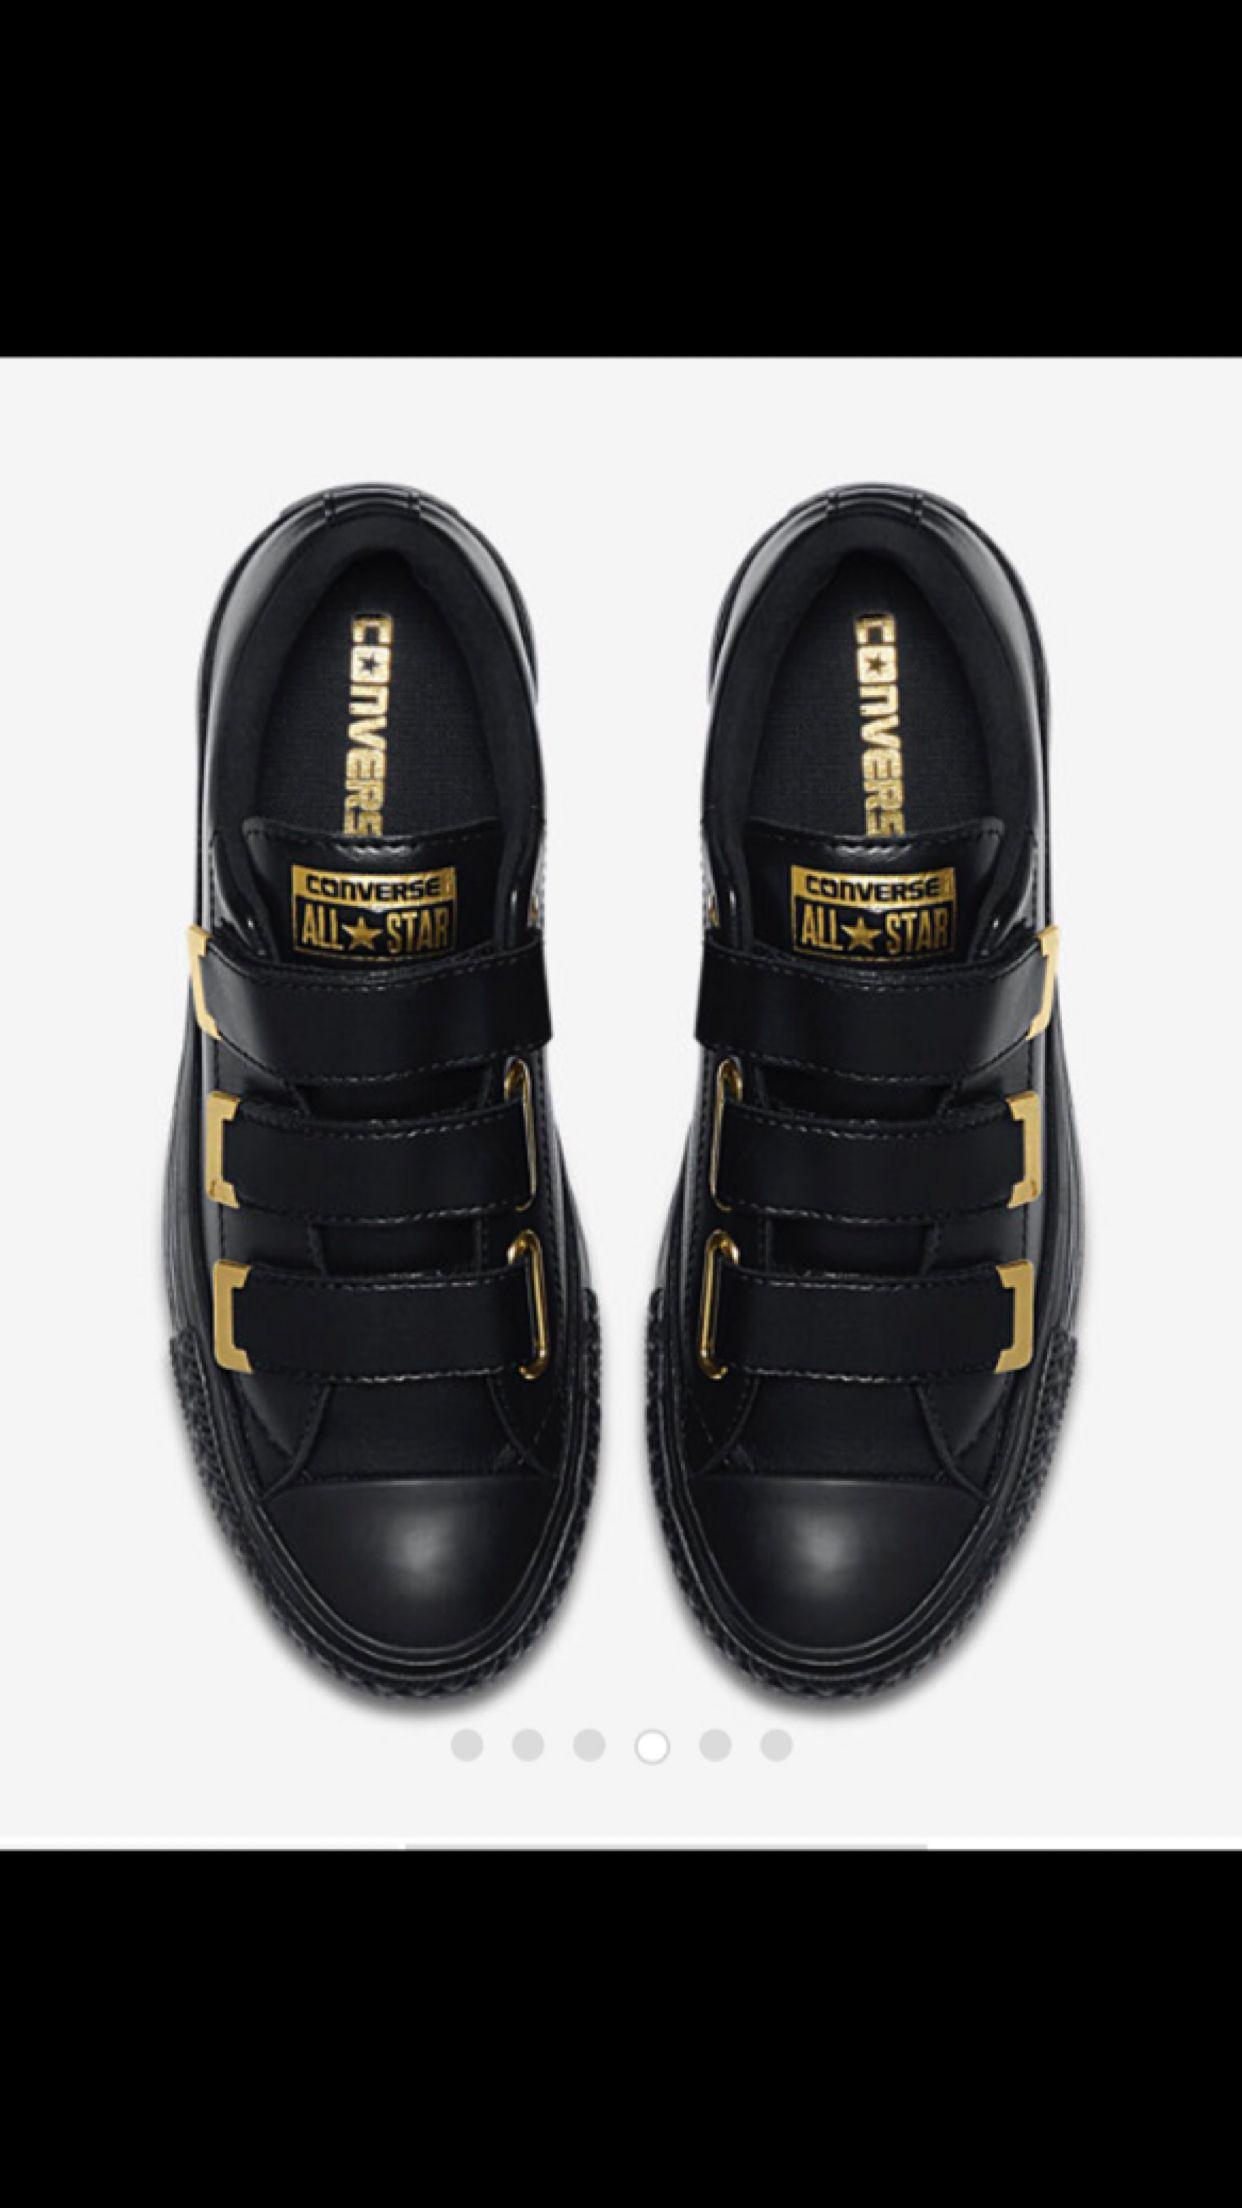 fd2868f8199c7e Converse Chuck Taylor All Star 3V Low Top Women s Shoe